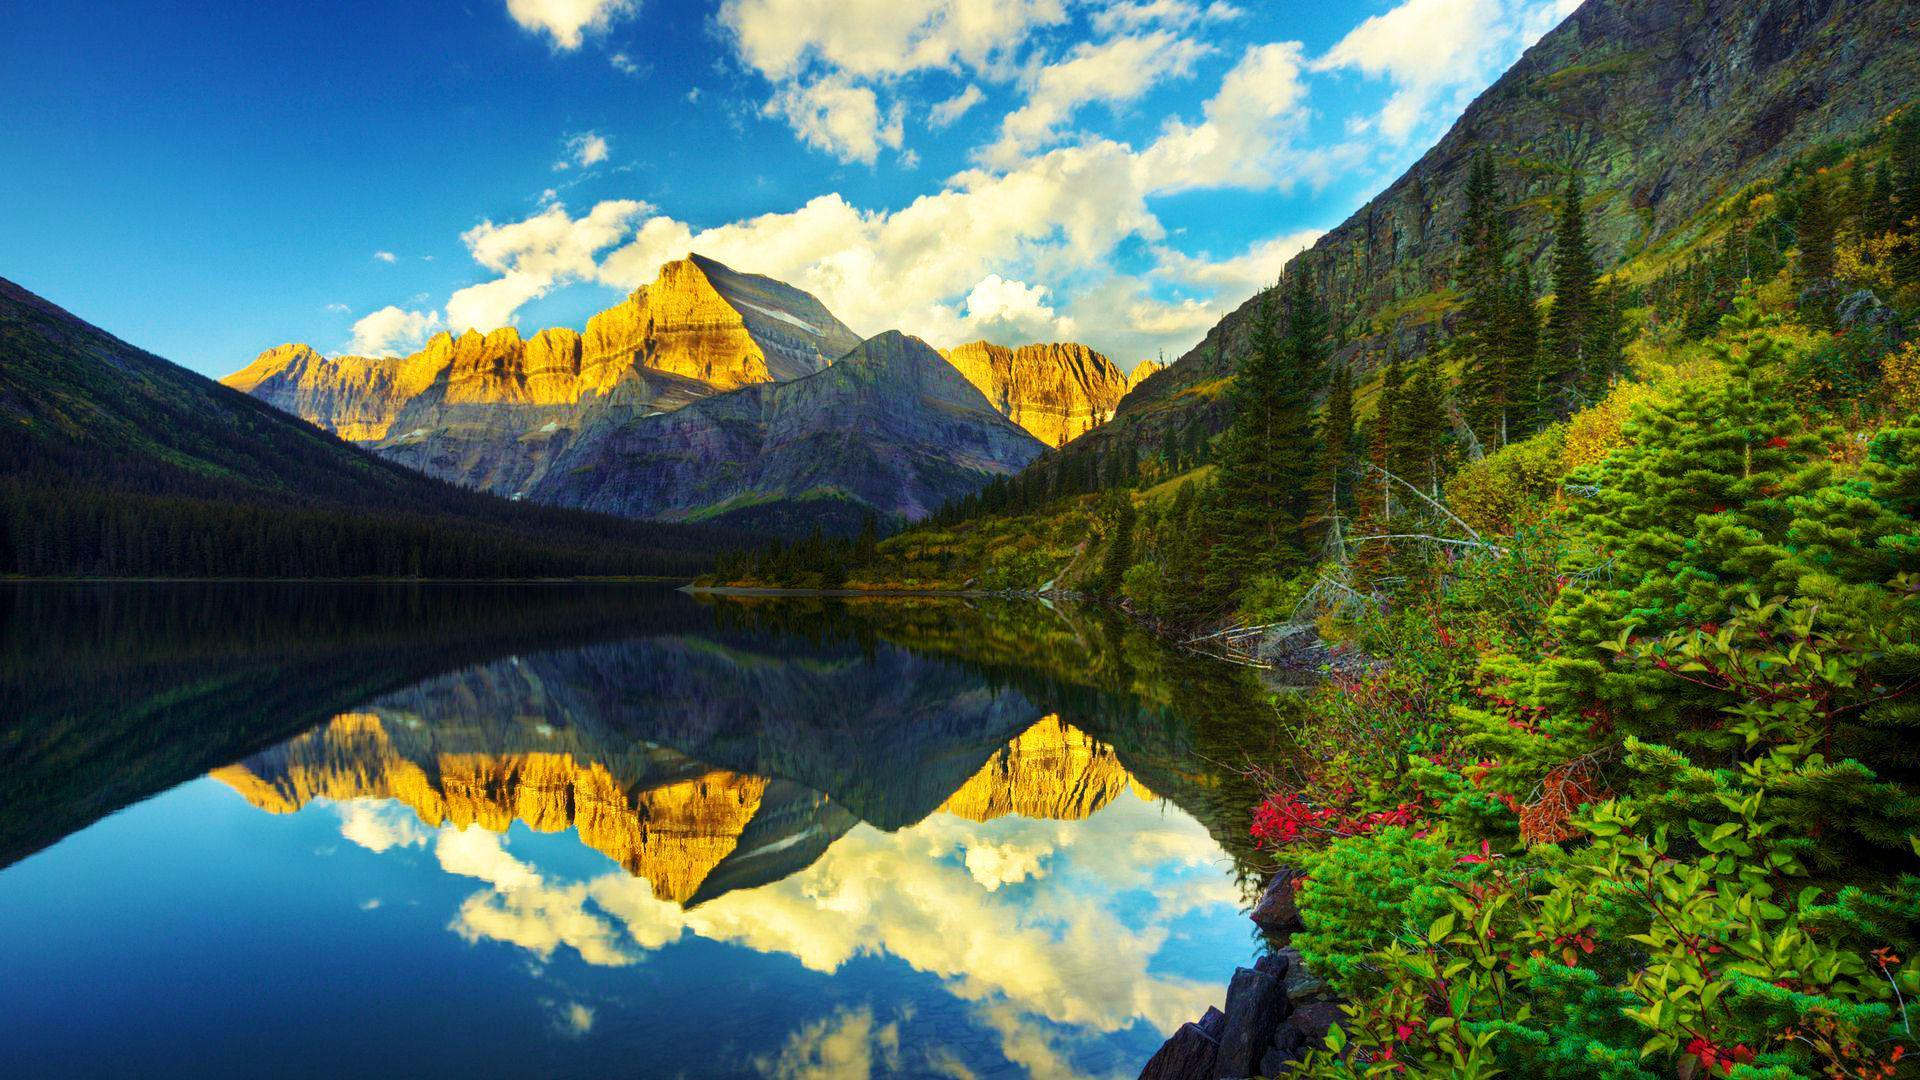 Glacier National Park Hd Wallpapers Wallpaper Cave